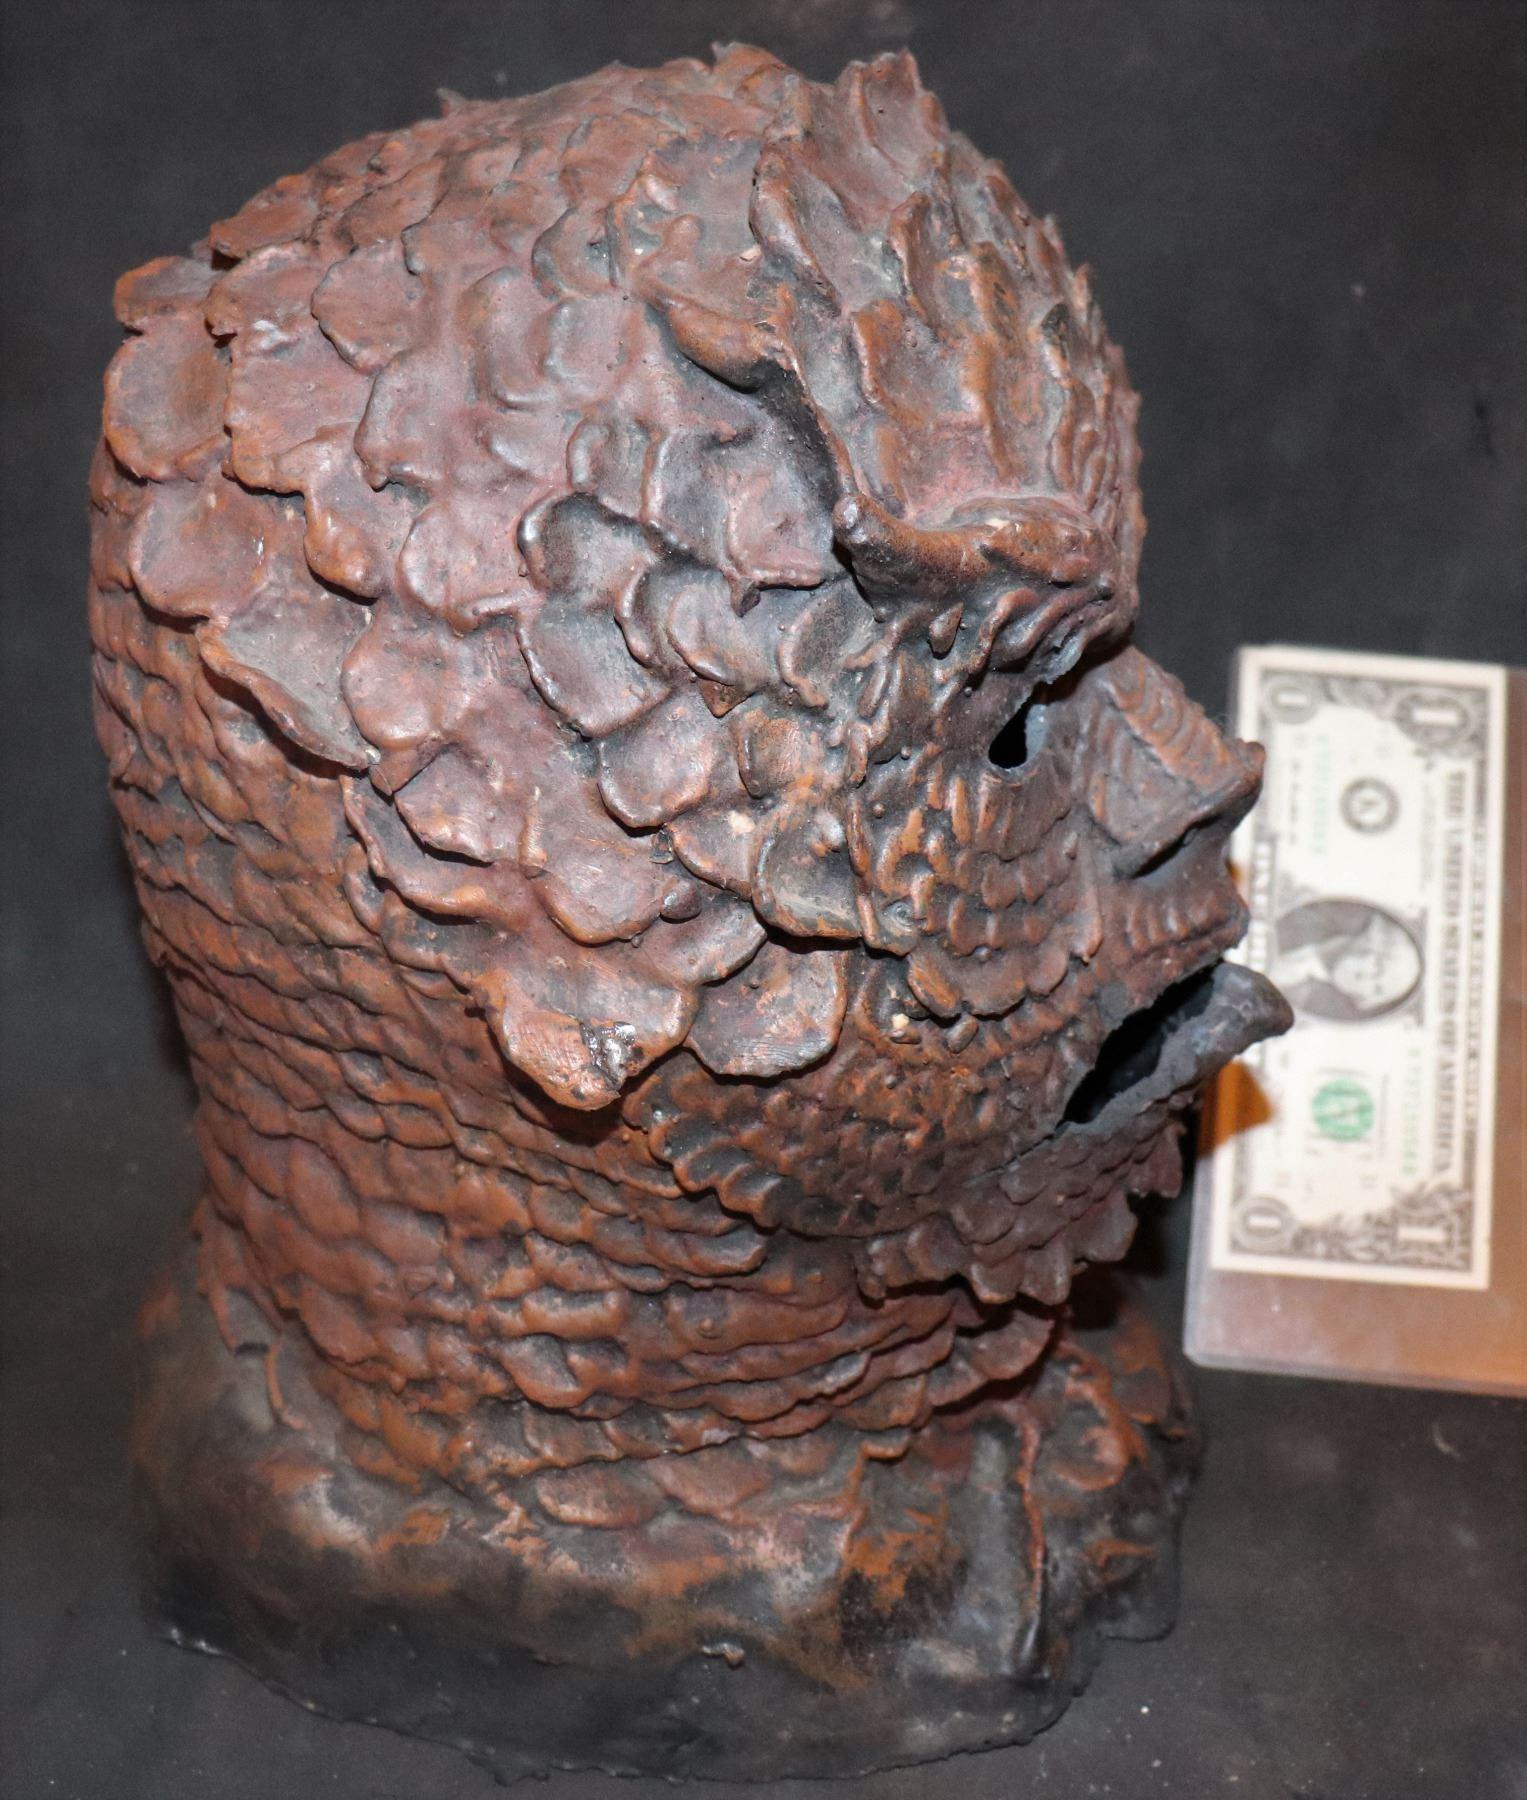 Money talks nude pussy pics